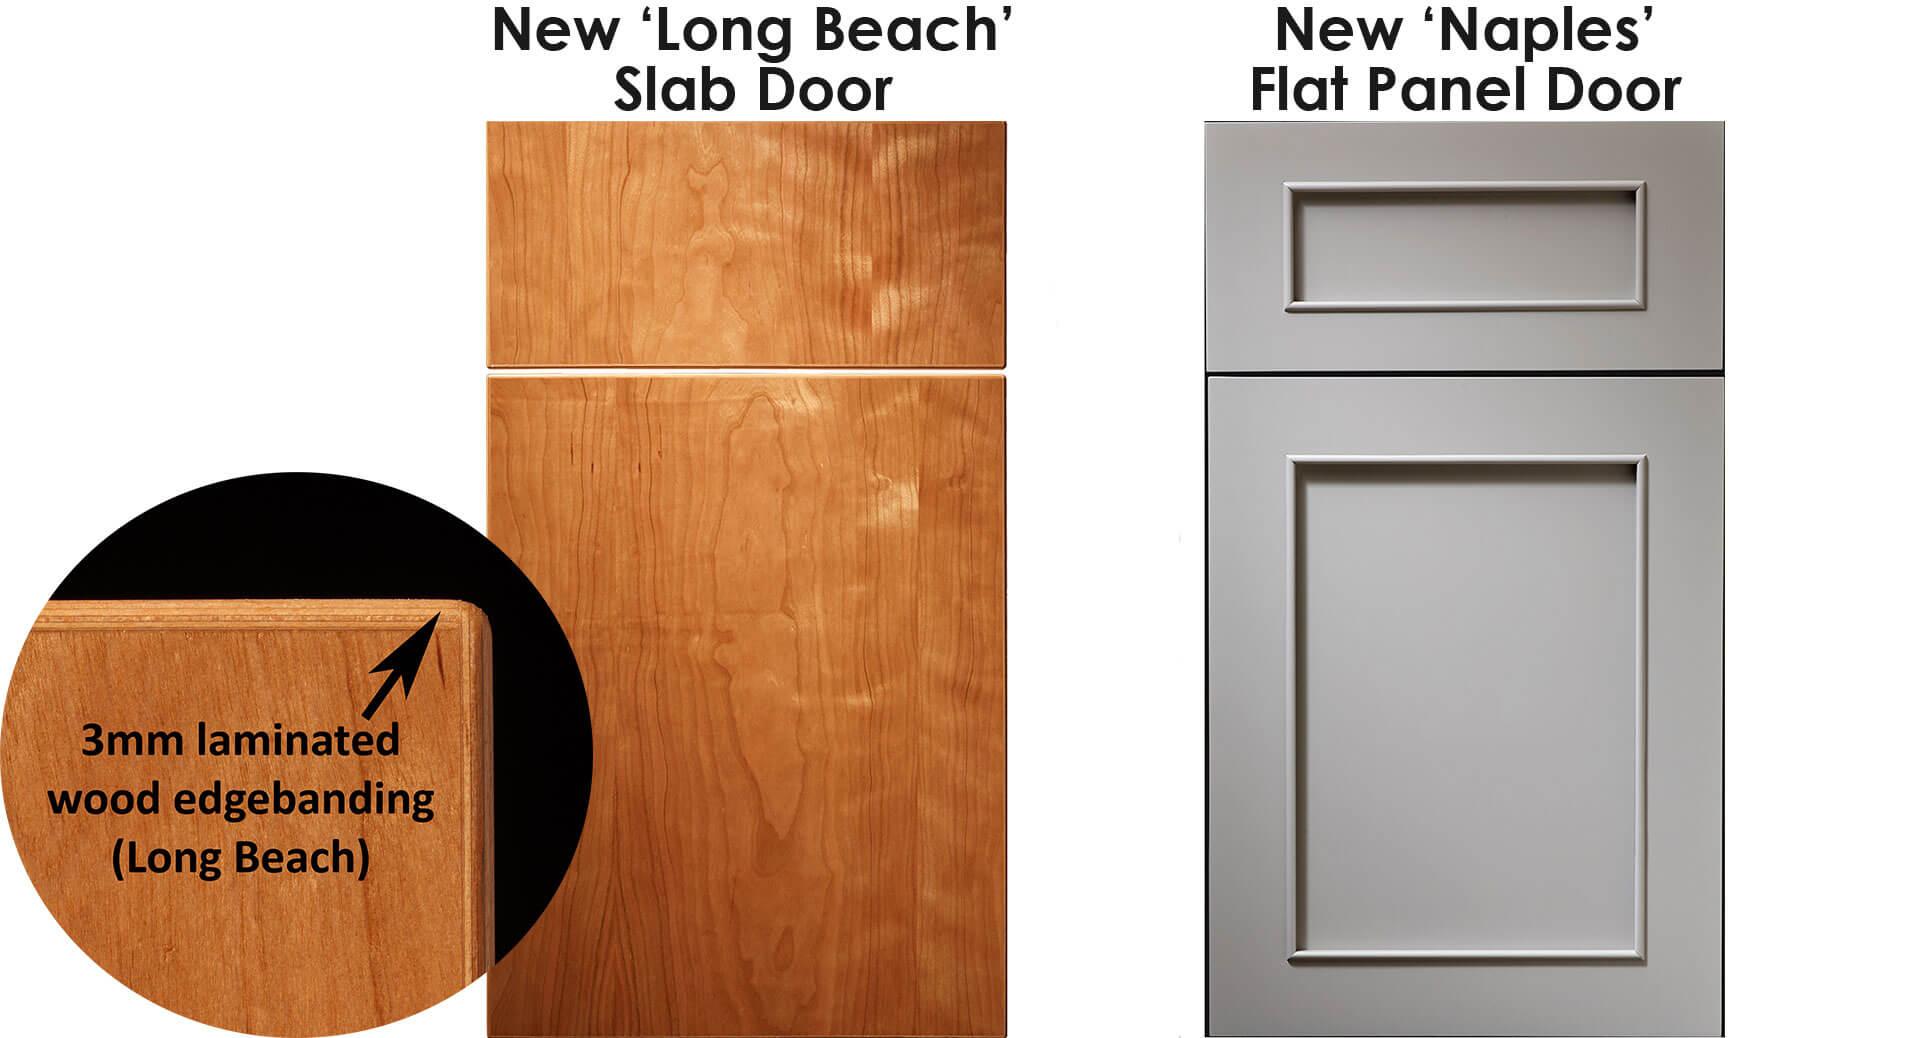 woodharbor cabinets reviews | Nrtradiant.com